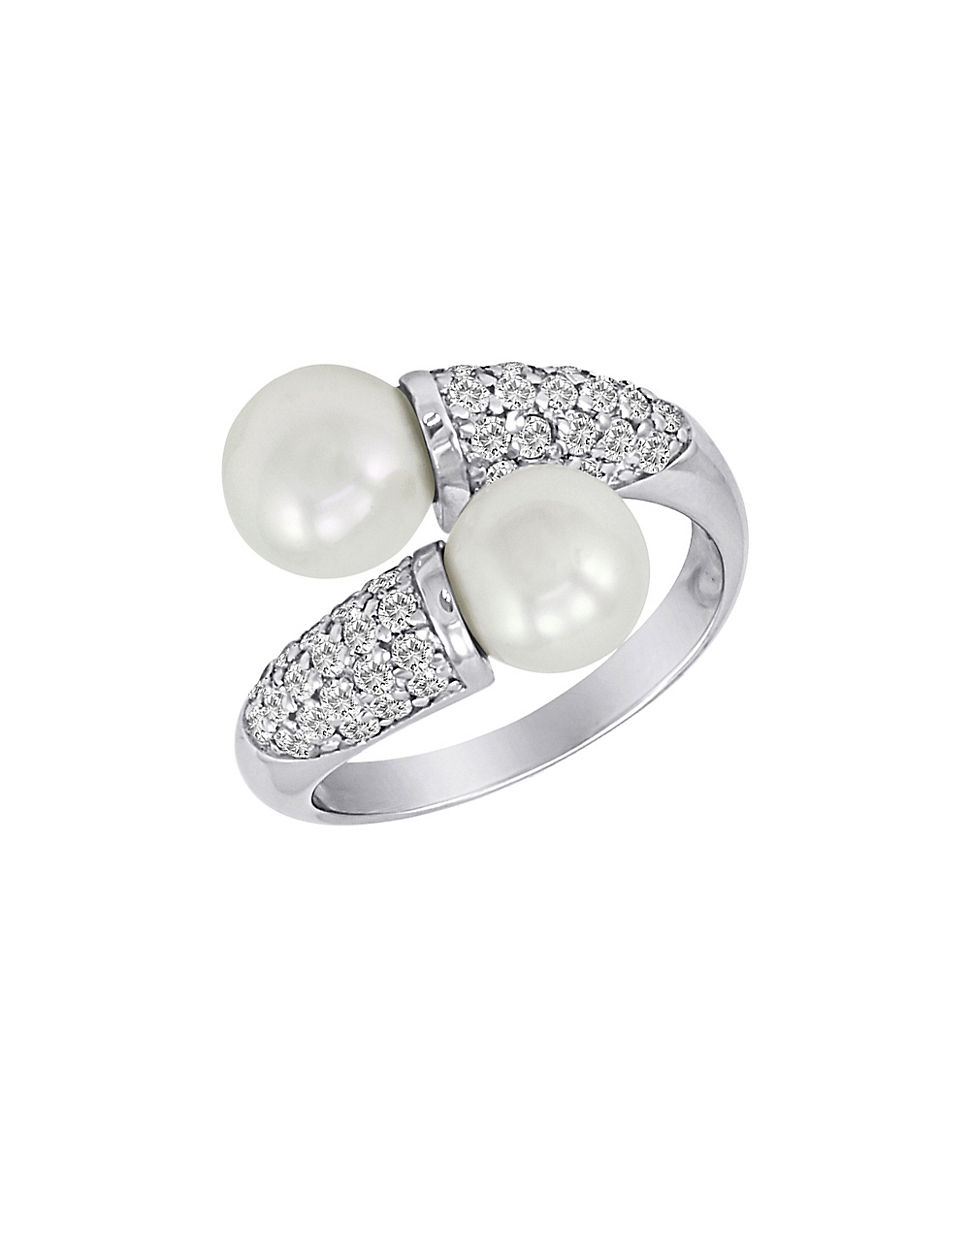 Majorica 12mm Pearl & Cubic Zirconia Pavé Ring SSS1e41